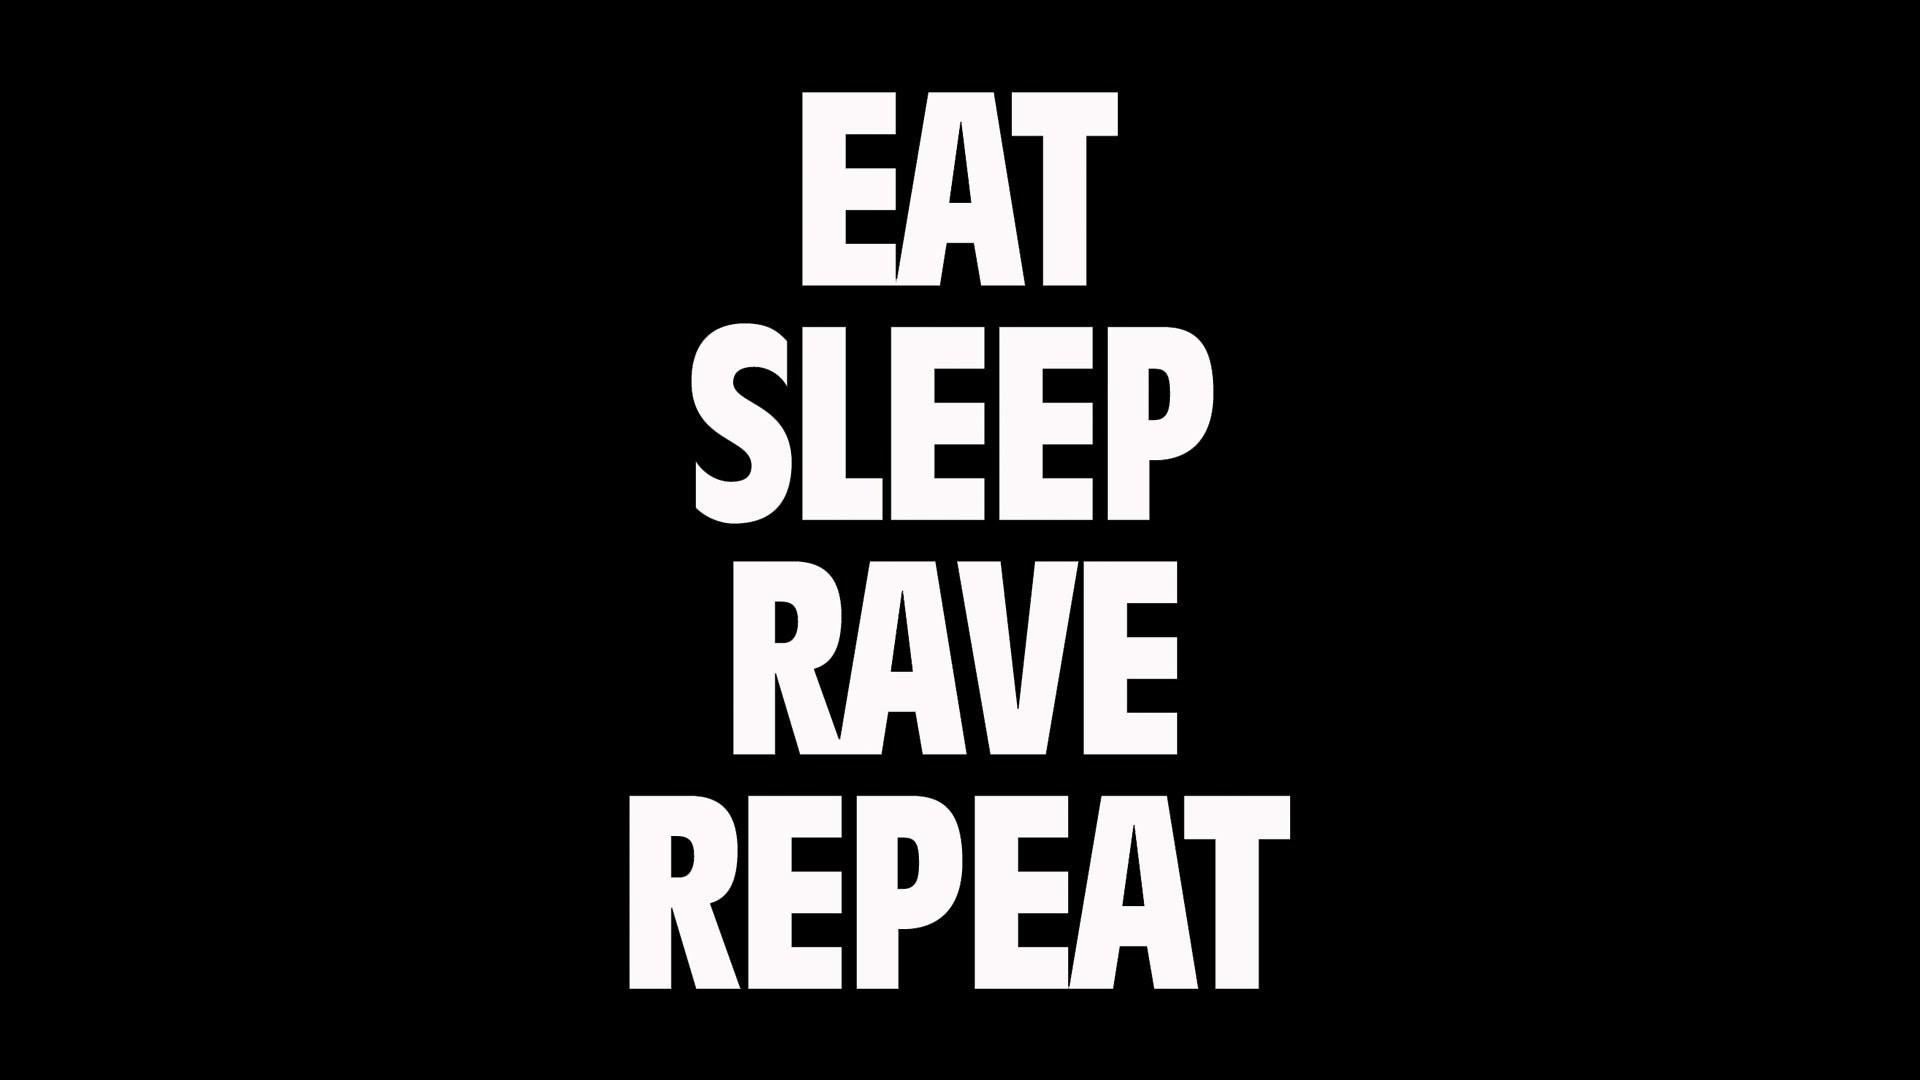 eat sleep rave repeat wallpaper …